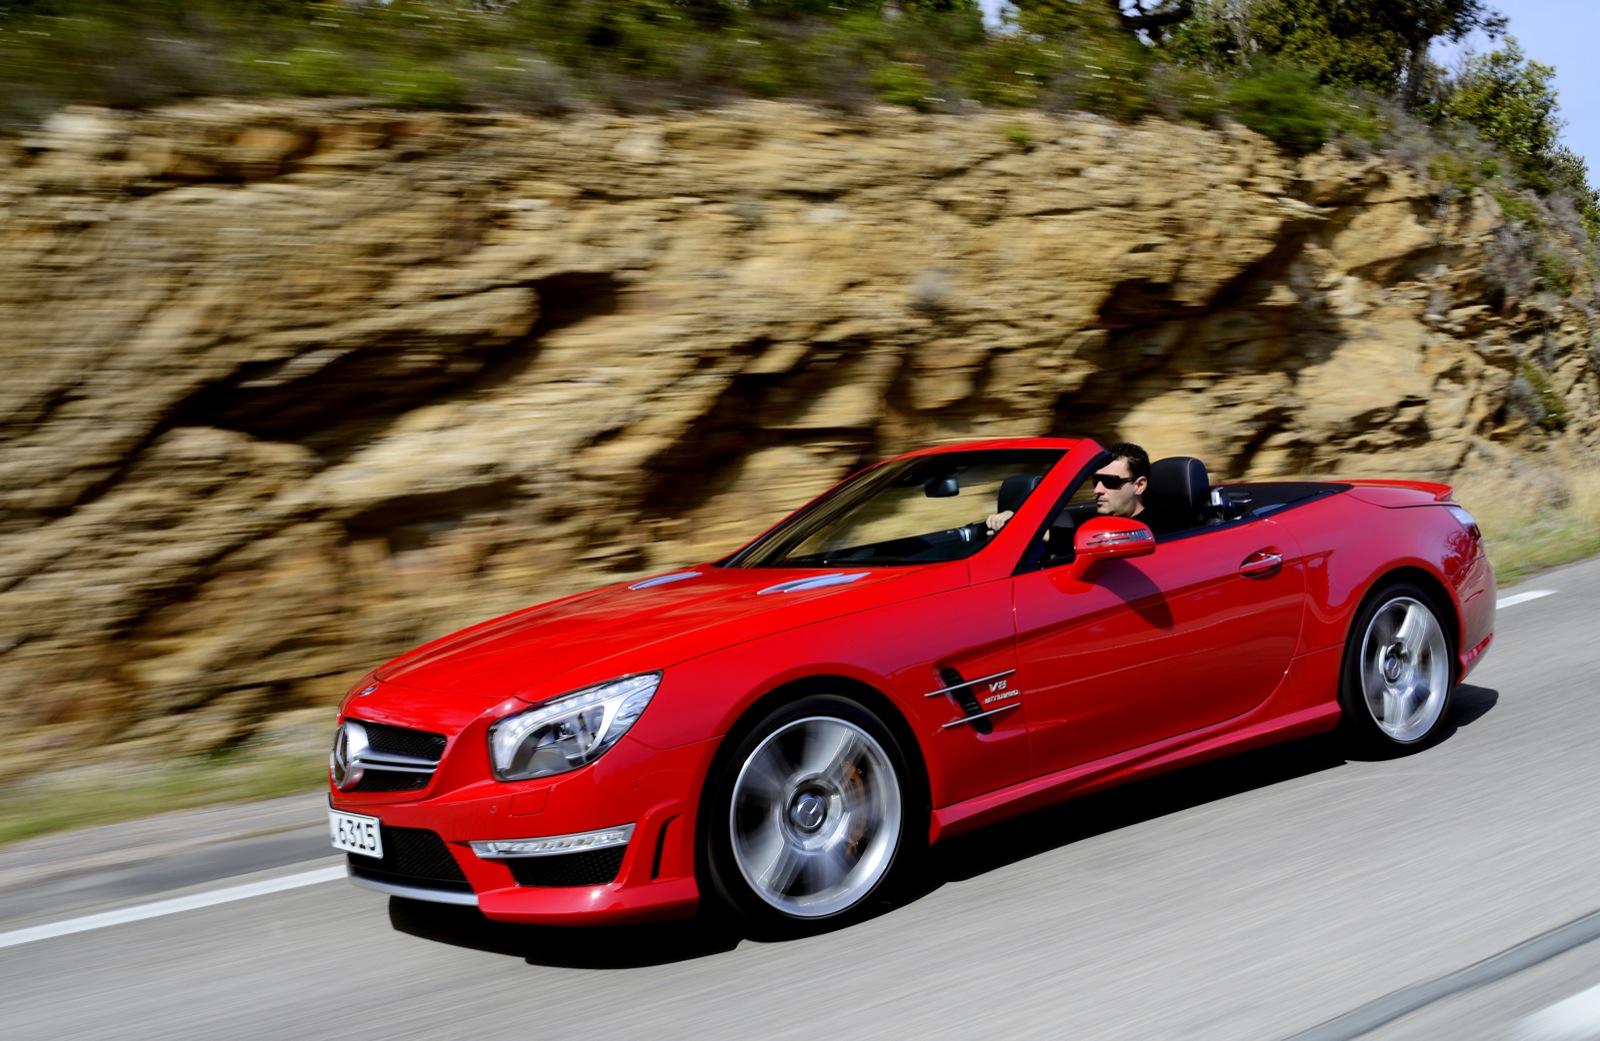 Chris Harris Tests The 2013 Mercedes-Benz SL63 AMG: Video